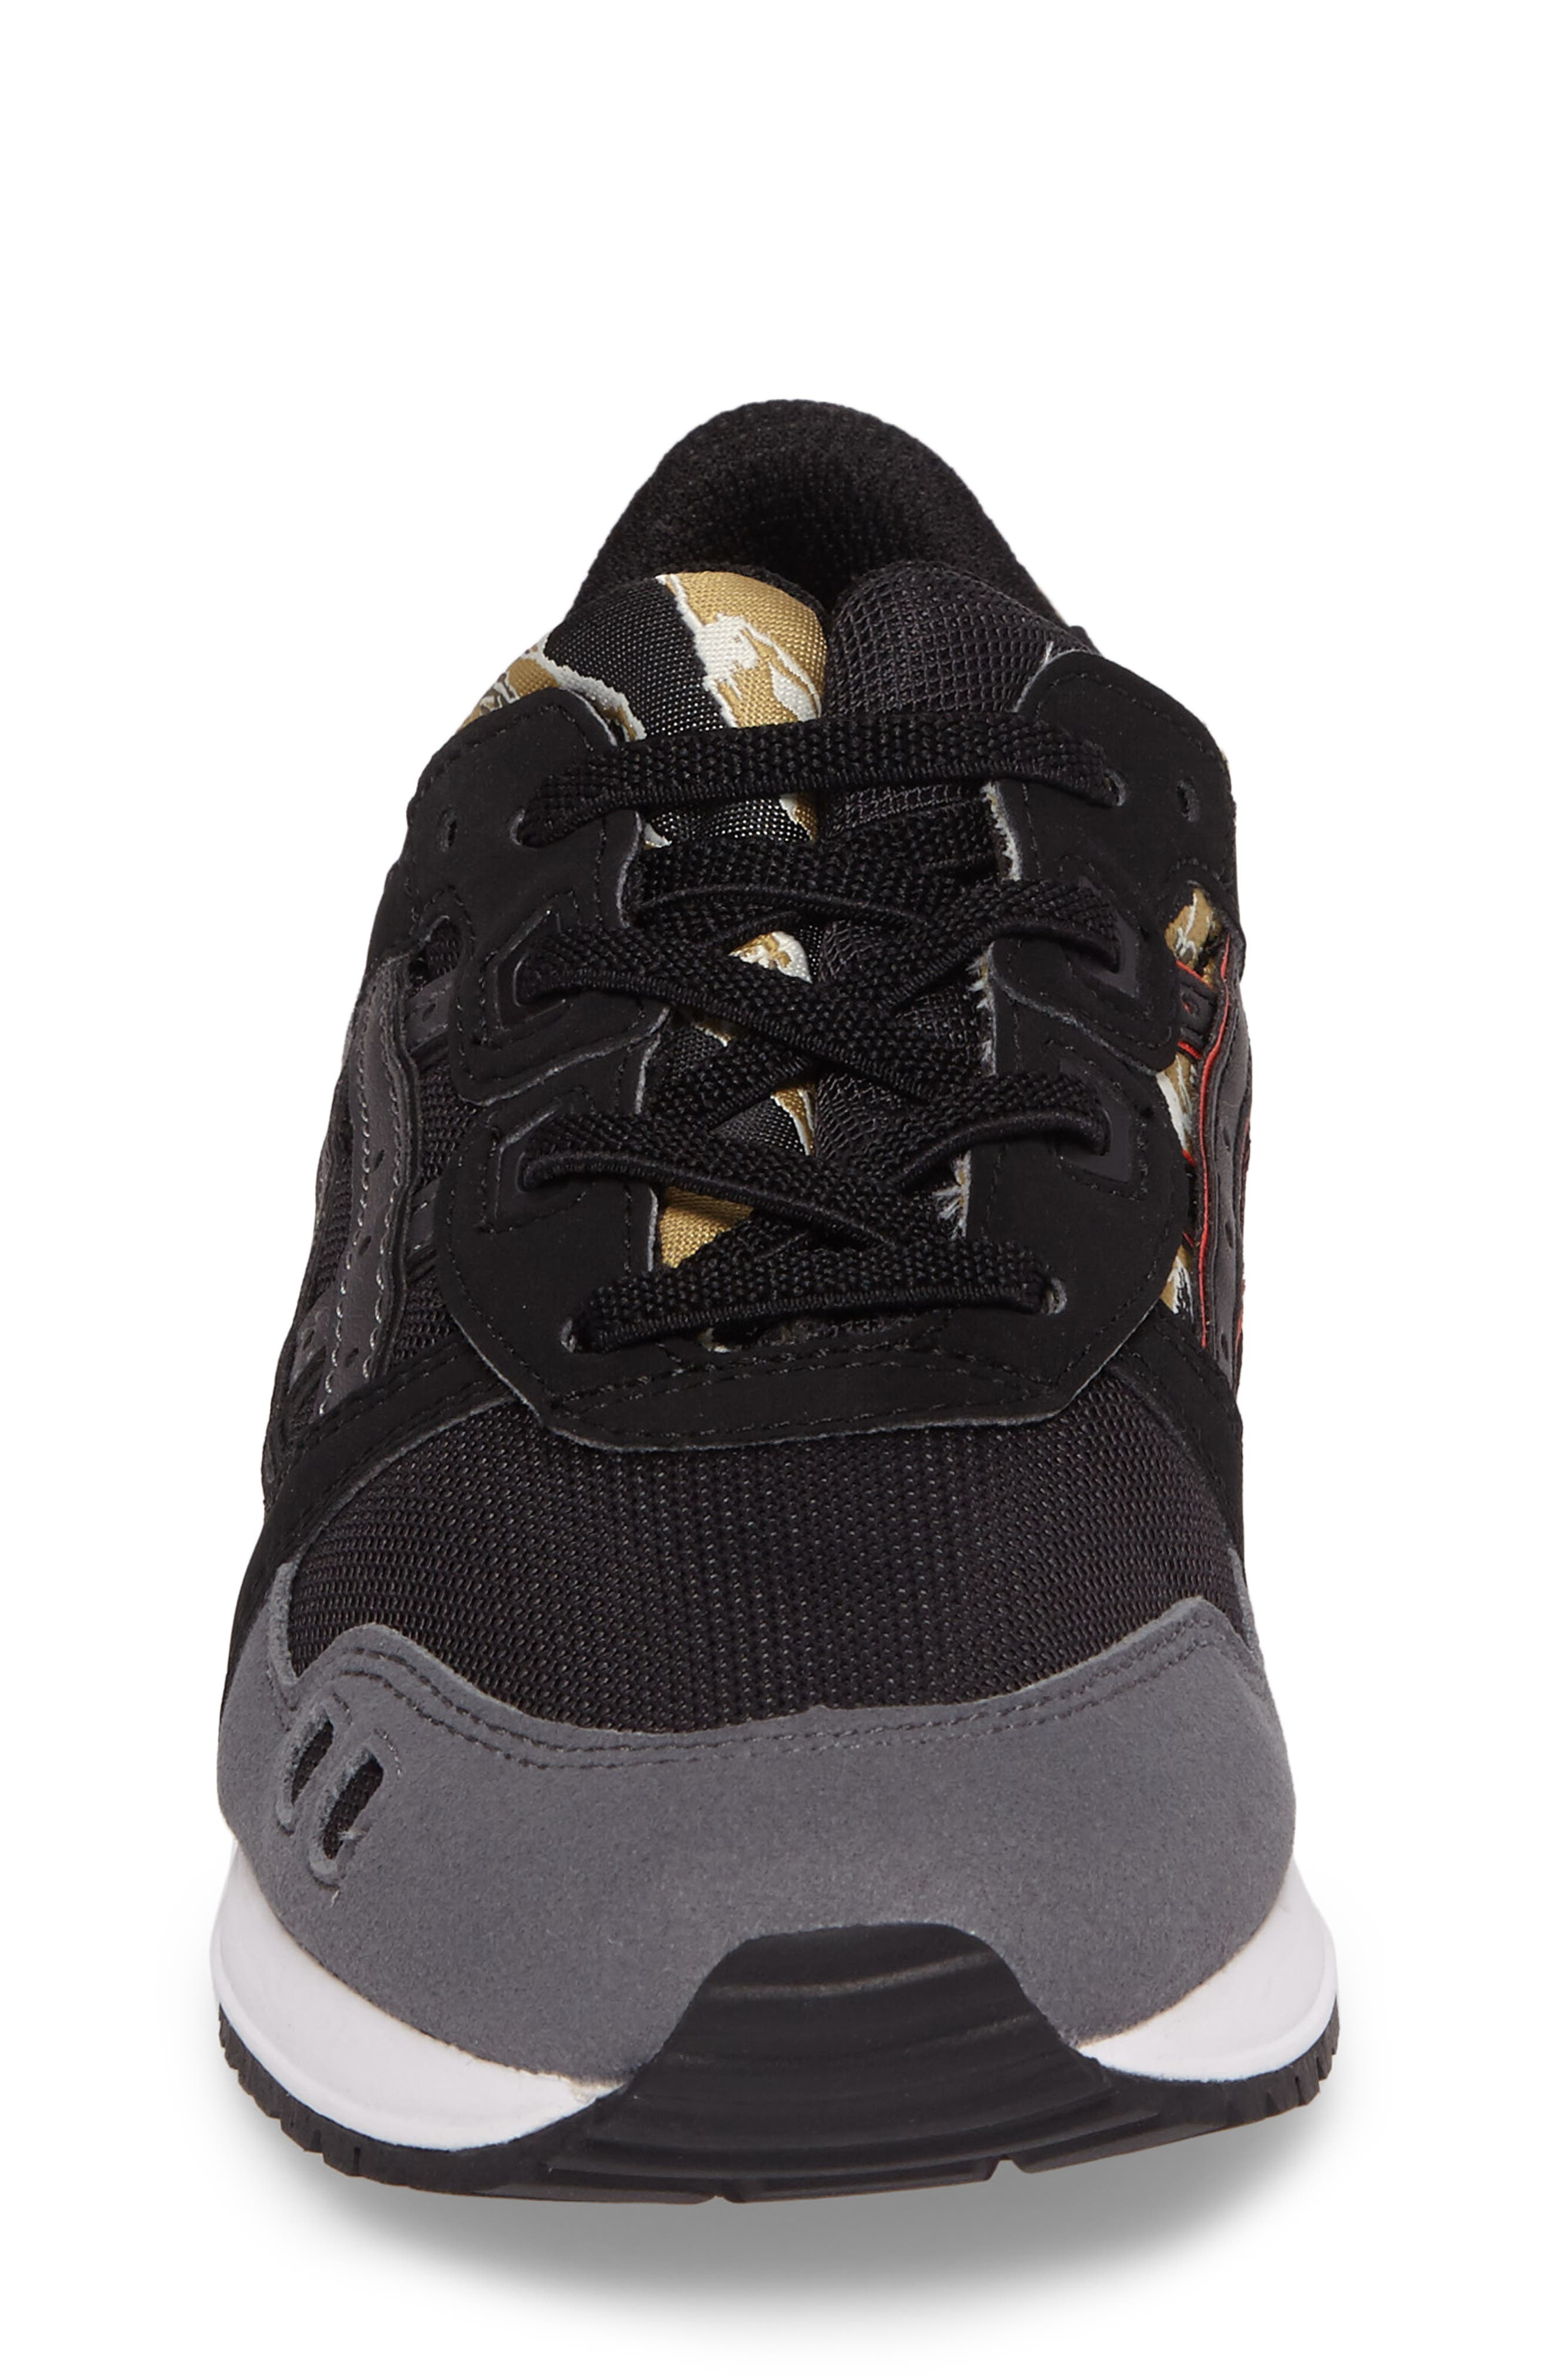 GEL-LYTE<sup>®</sup> III PS Slip-On Sneaker,                             Alternate thumbnail 4, color,                             001